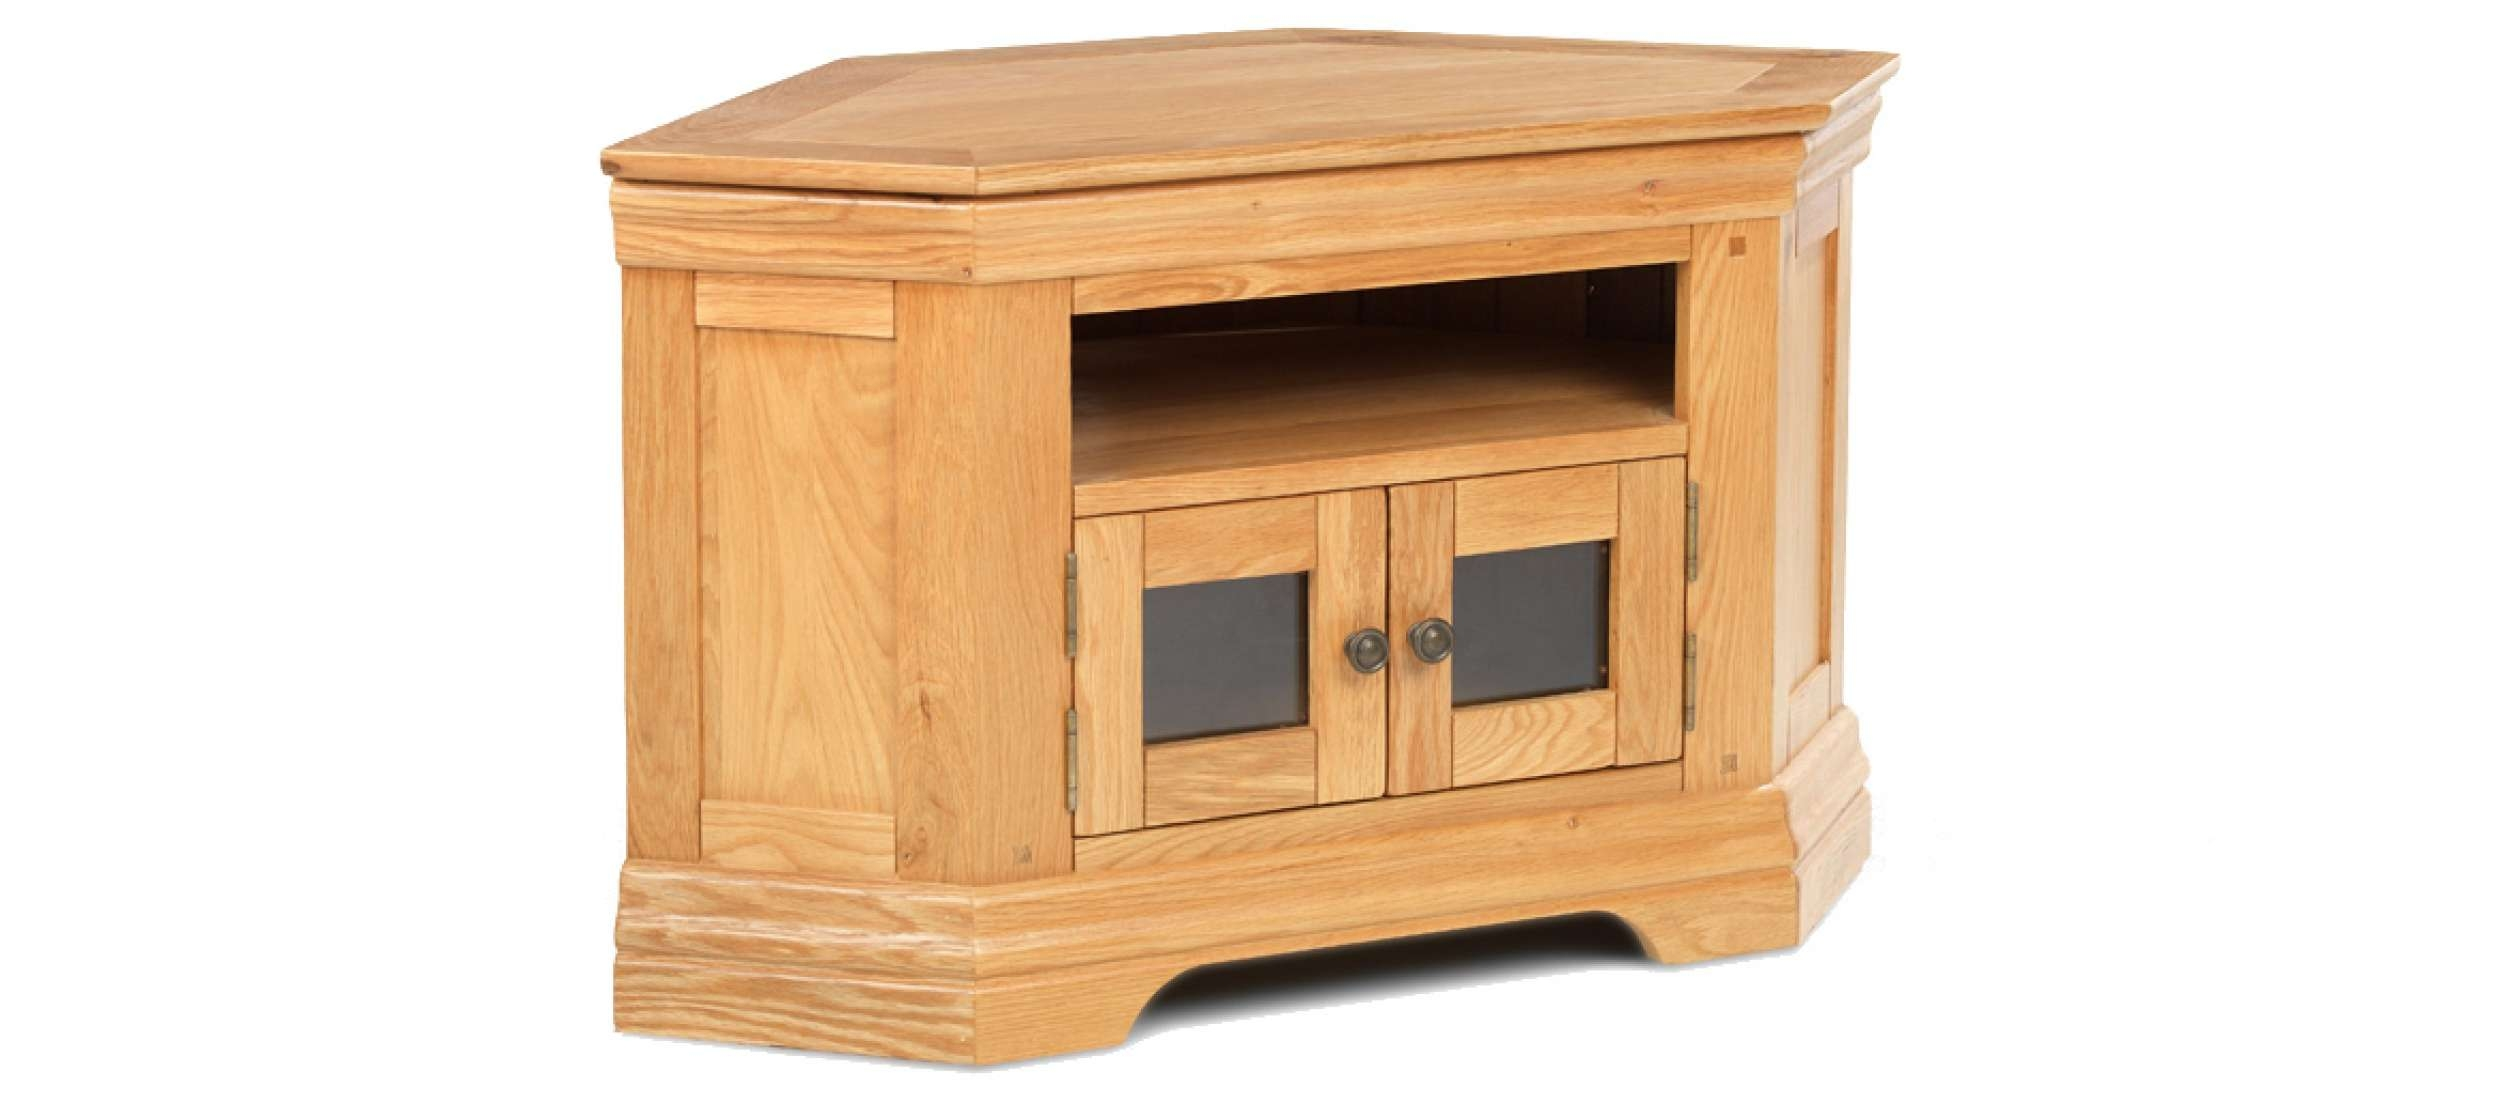 Constance Oak Corner Tv Cabinet | Quercus Living In Wooden Corner Tv Cabinets (View 13 of 20)